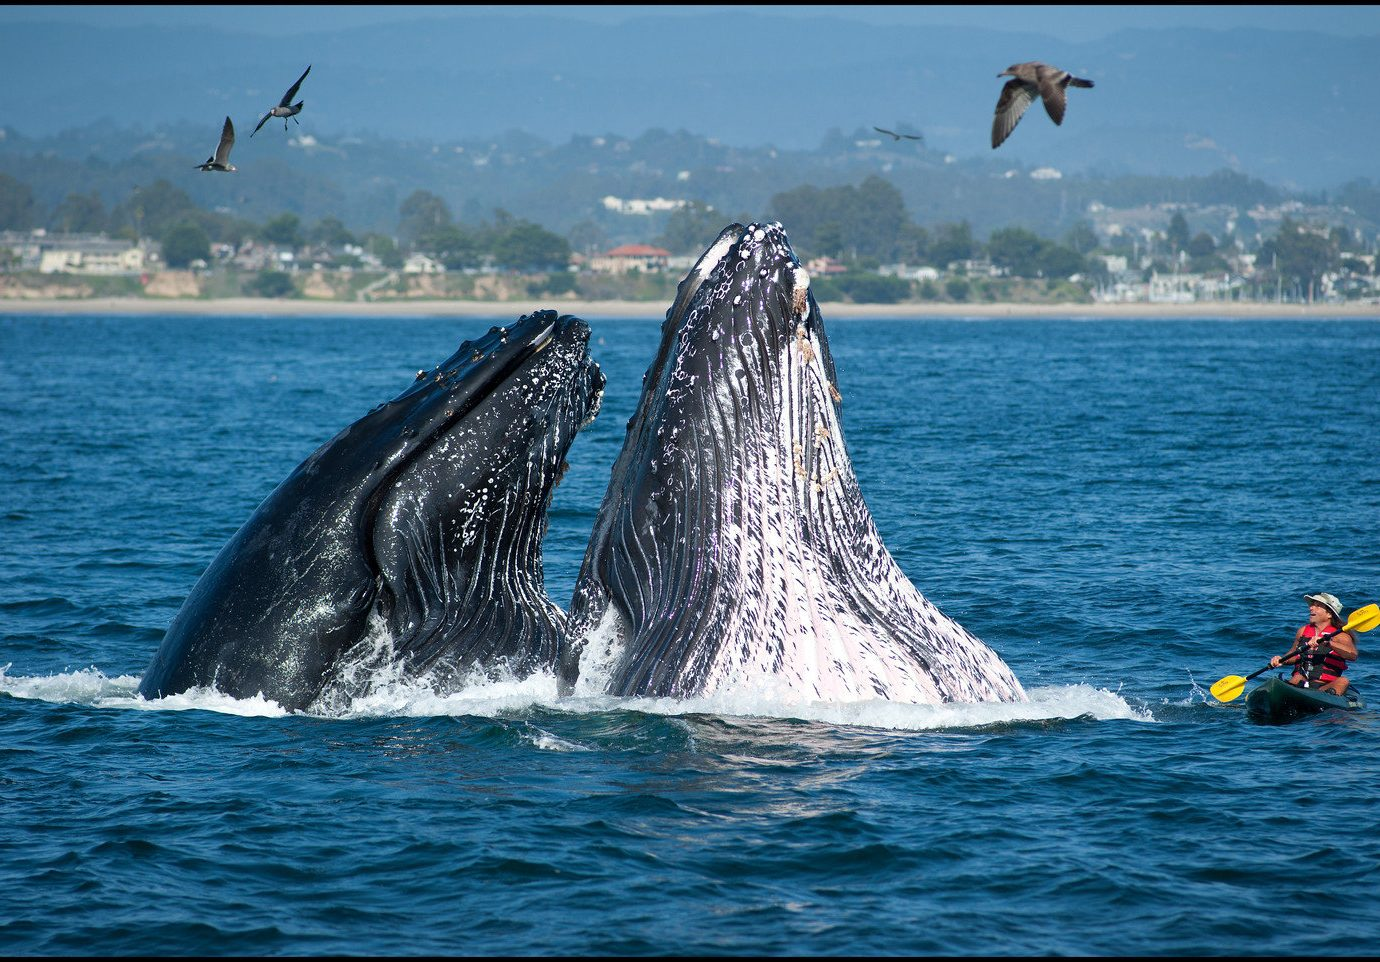 Trip Ideas water outdoor sky aquatic mammal animal mammal marine mammal vertebrate whales dolphins and porpoises marine biology Boat humpback whale Ocean whale Sea grey whale biology wind wave